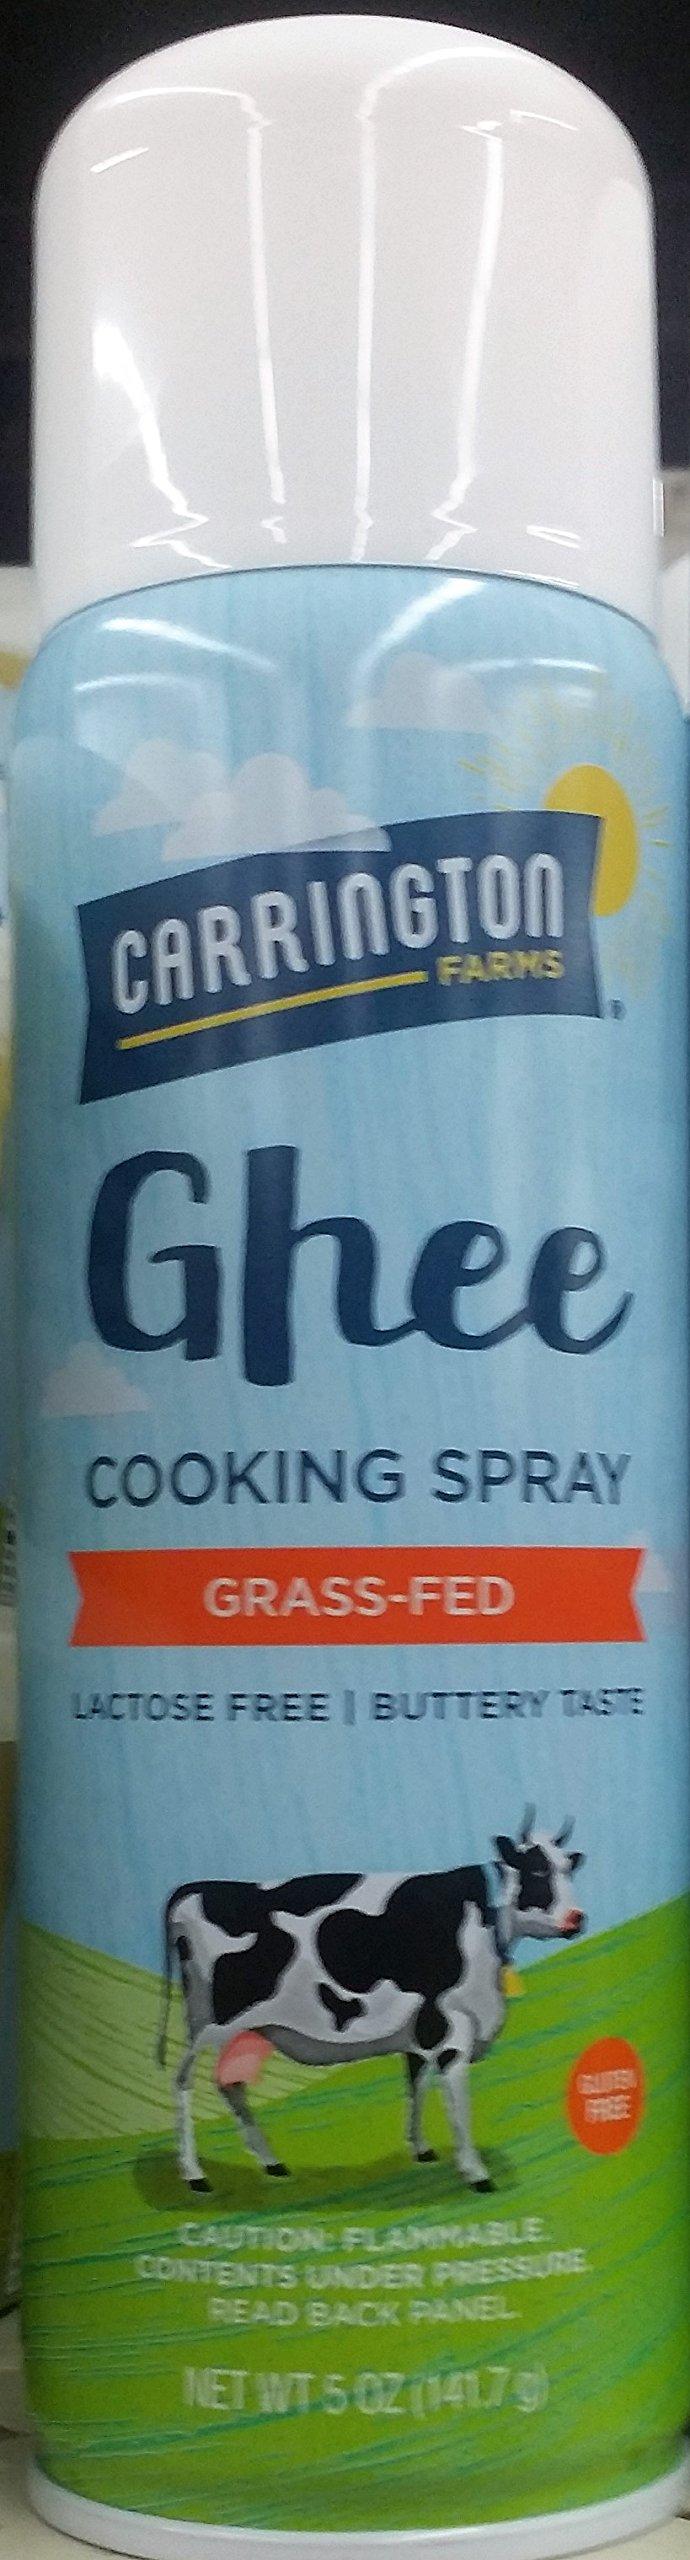 Carrington Ghee Cooking Spray 5 oz (Pack of 2)